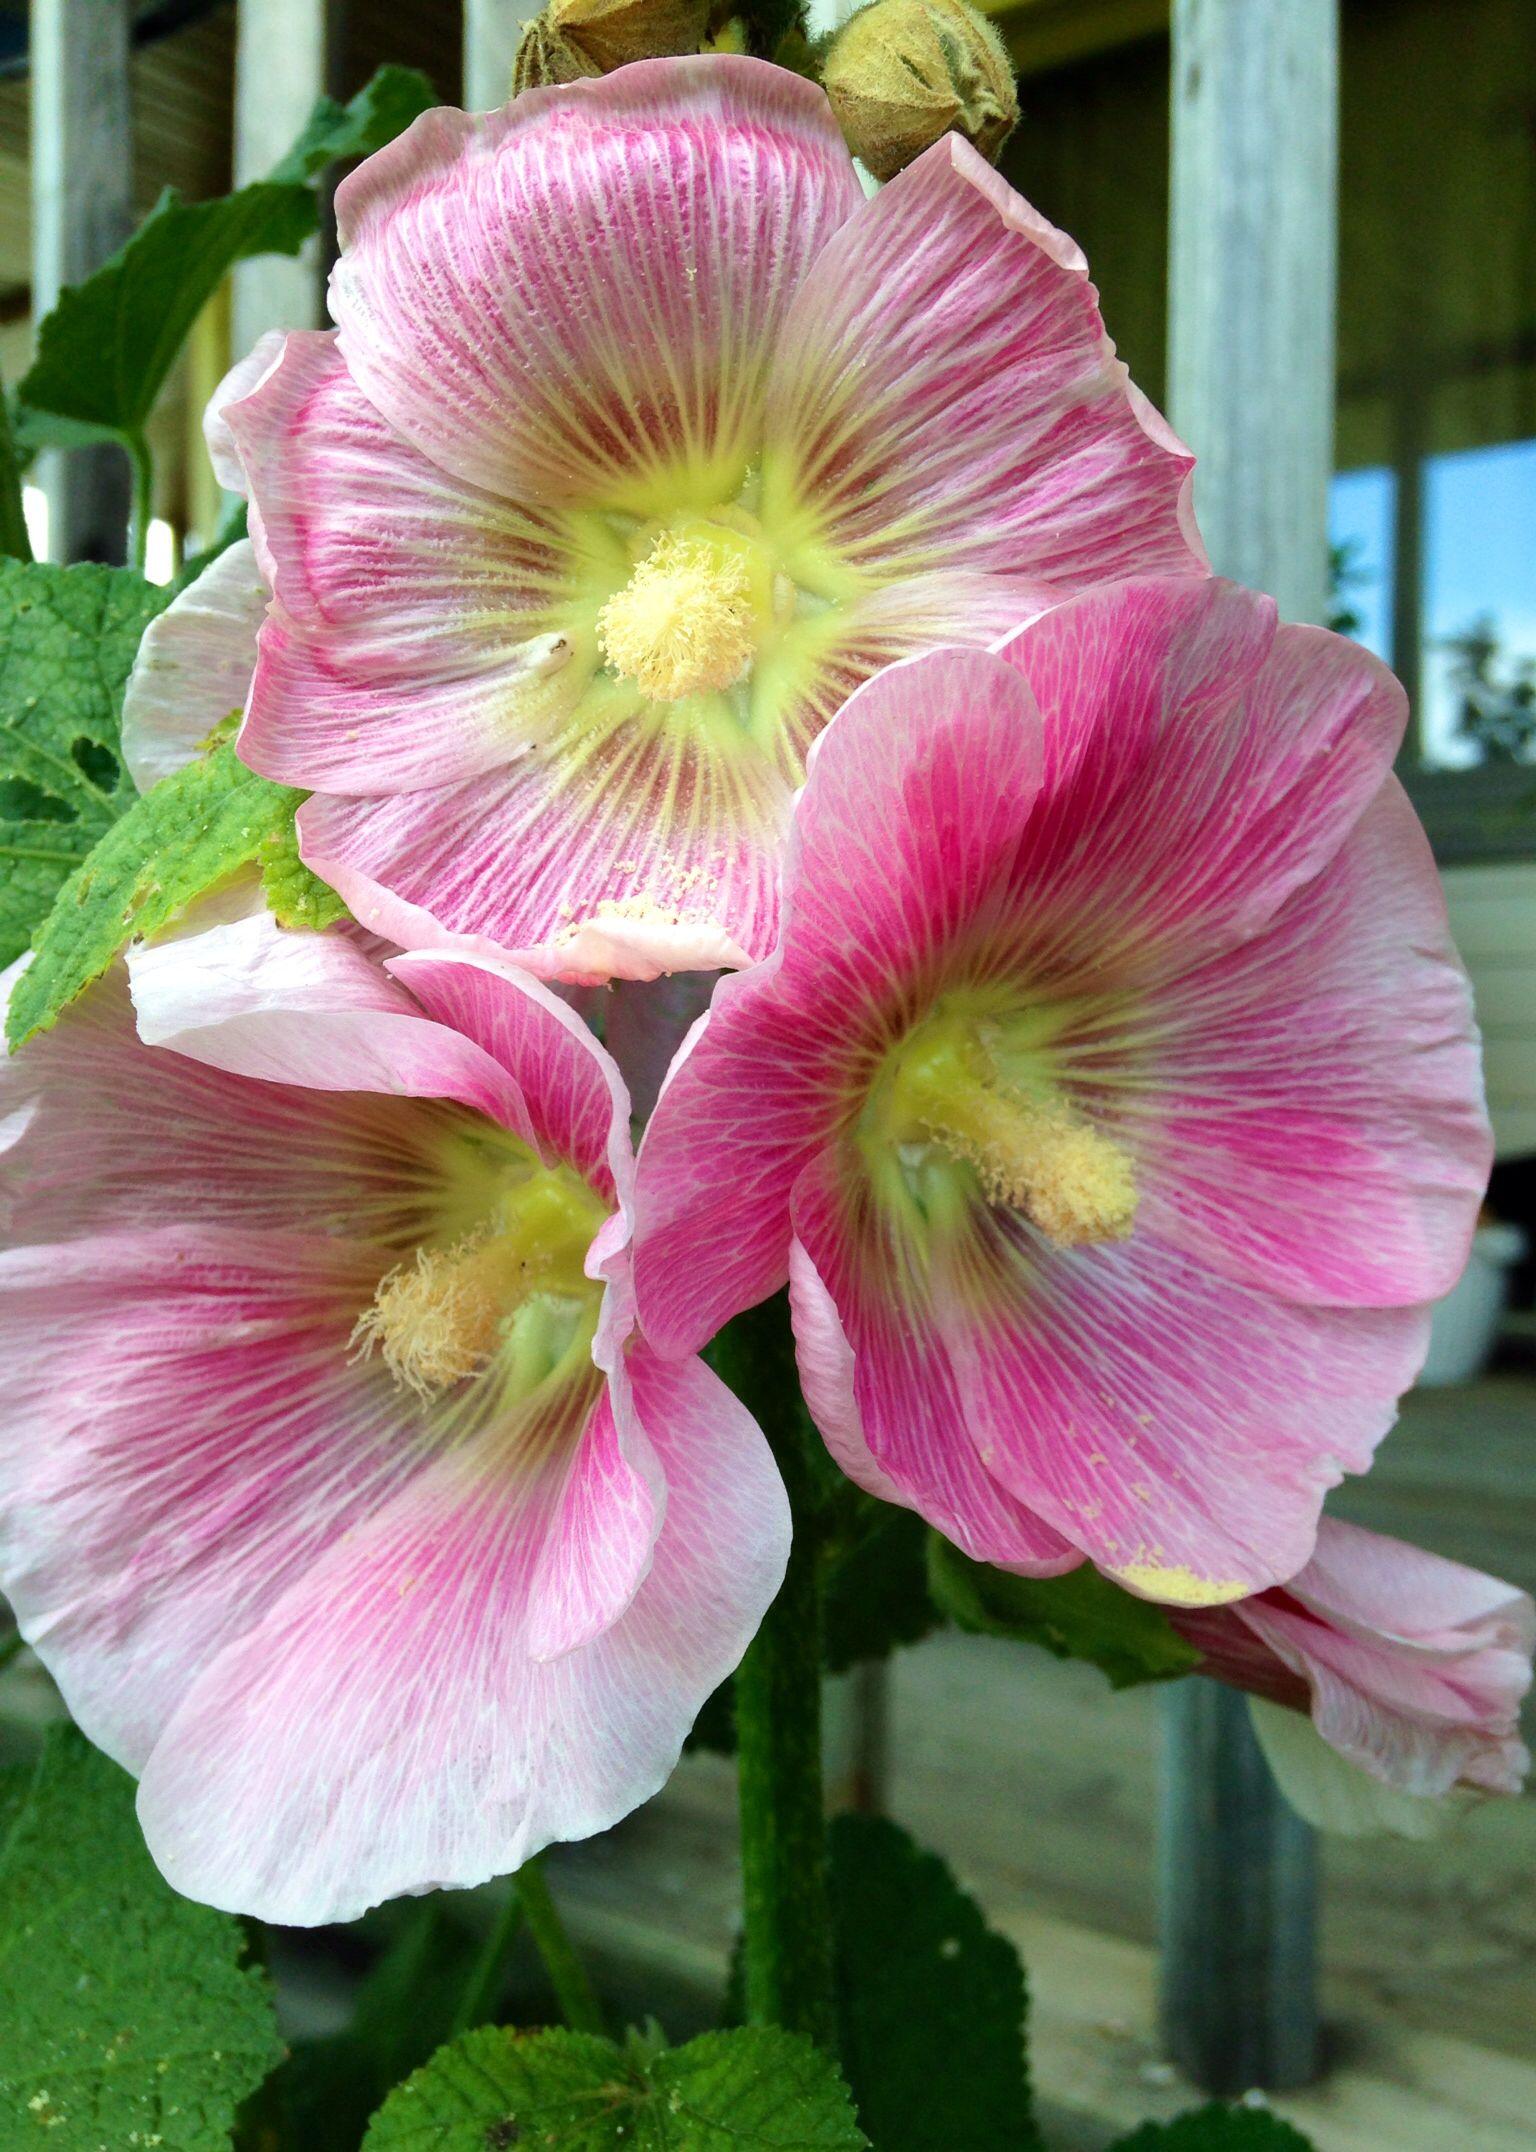 Hollyhocks, such pretty little girls. Beautiful flowers